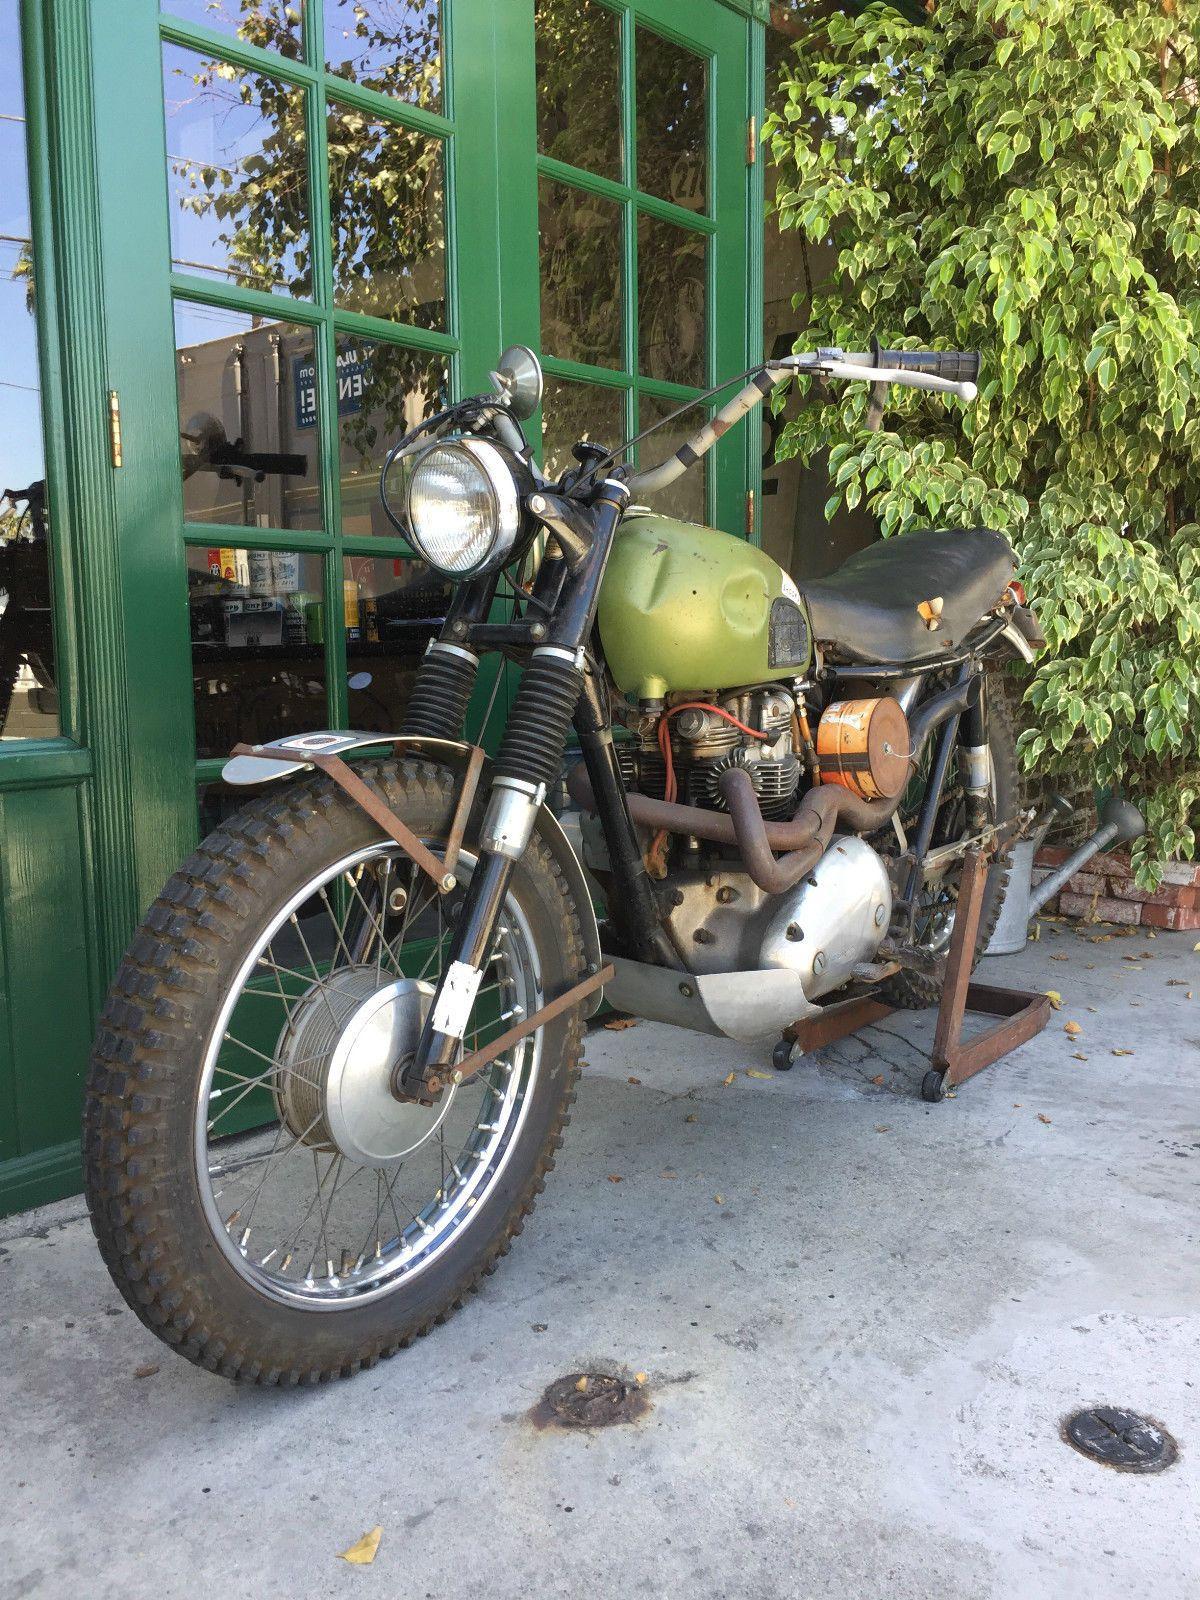 1966 Triumph Other